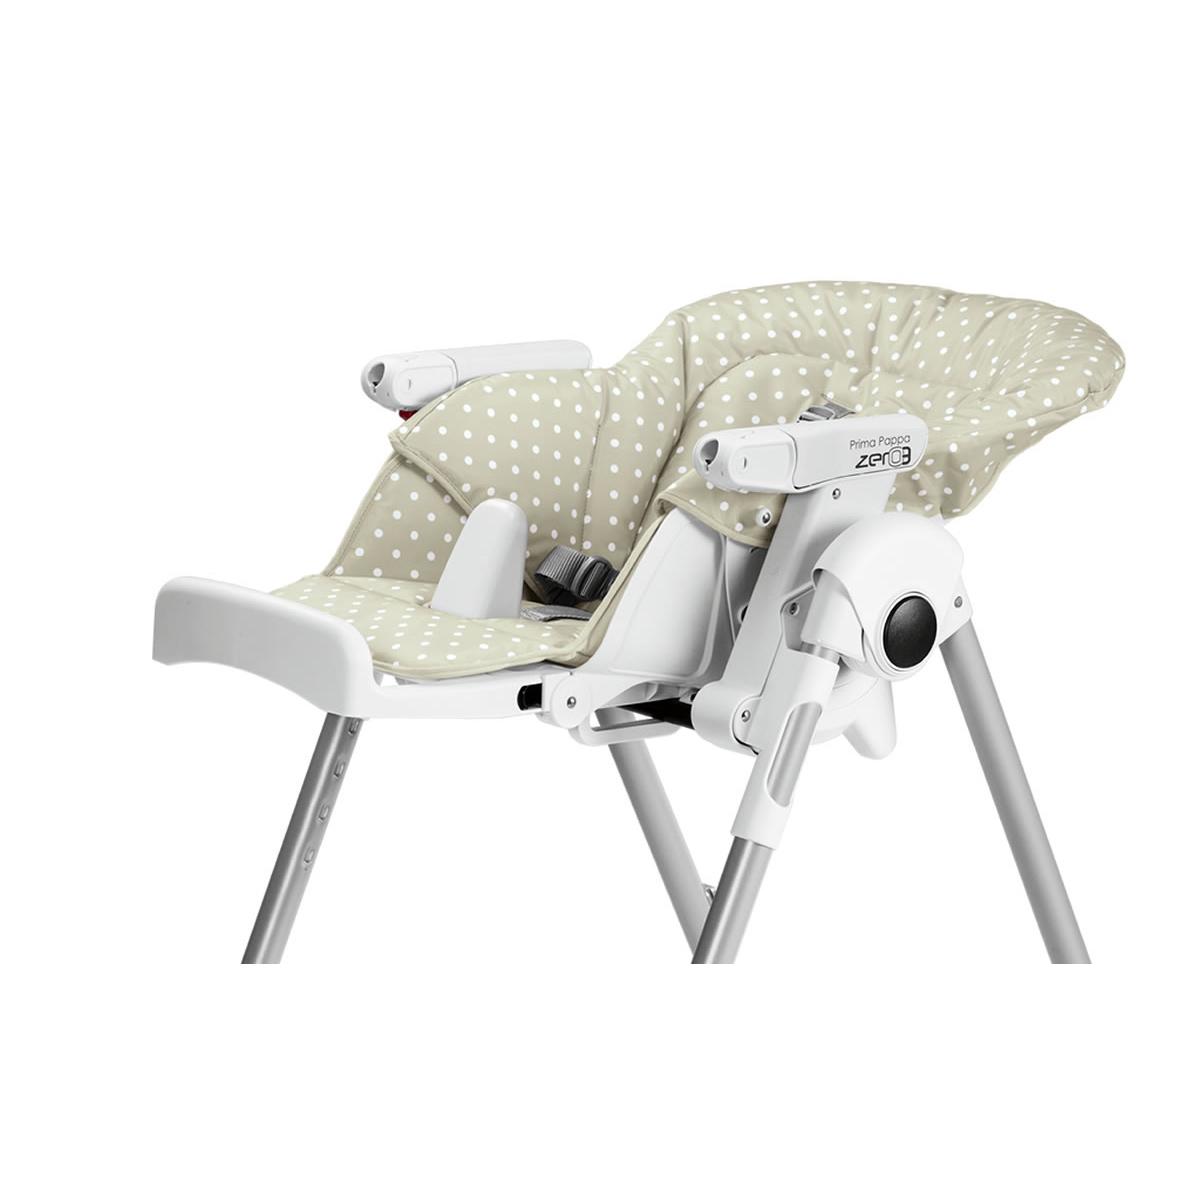 chaise prima pappa zero 3 baby dot beige impp030004poi46 achat vente chaise haute sur. Black Bedroom Furniture Sets. Home Design Ideas